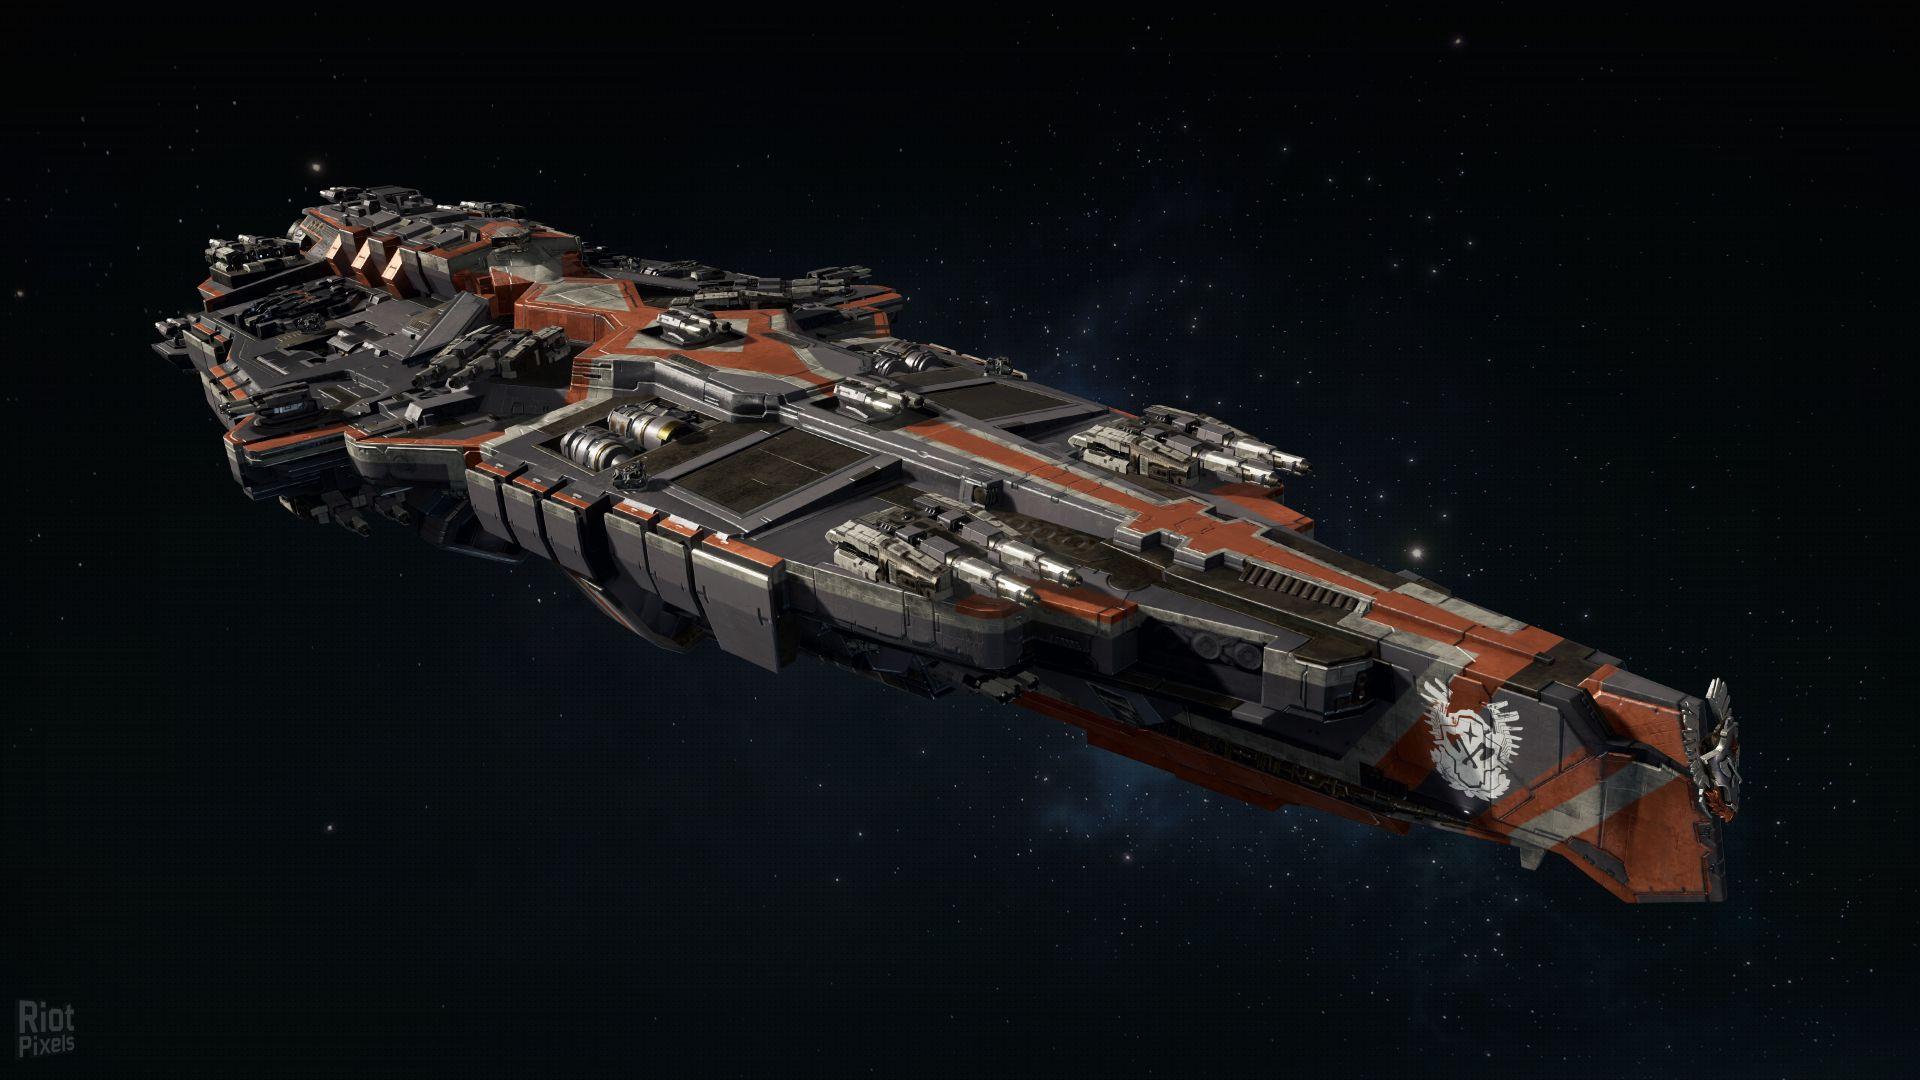 Dreadnought Wallpaper Games Dreadnought Space Ship Pc